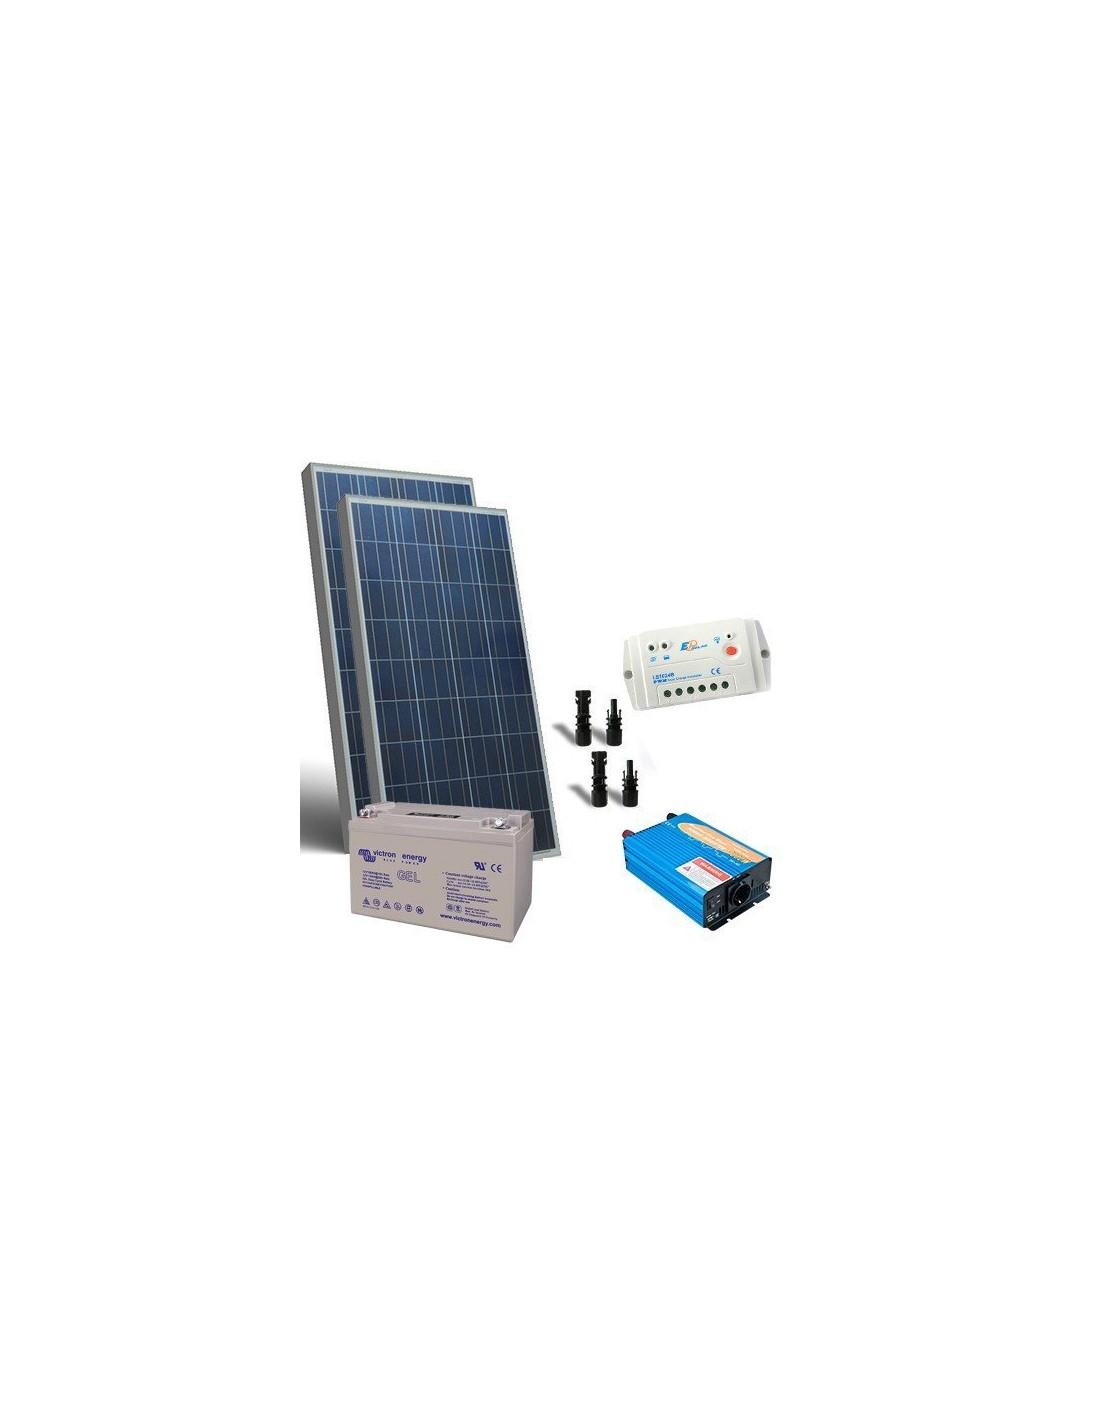 Kit Pannello Solare Batteria Inverter : Kit solare baita w v base pannello inverter